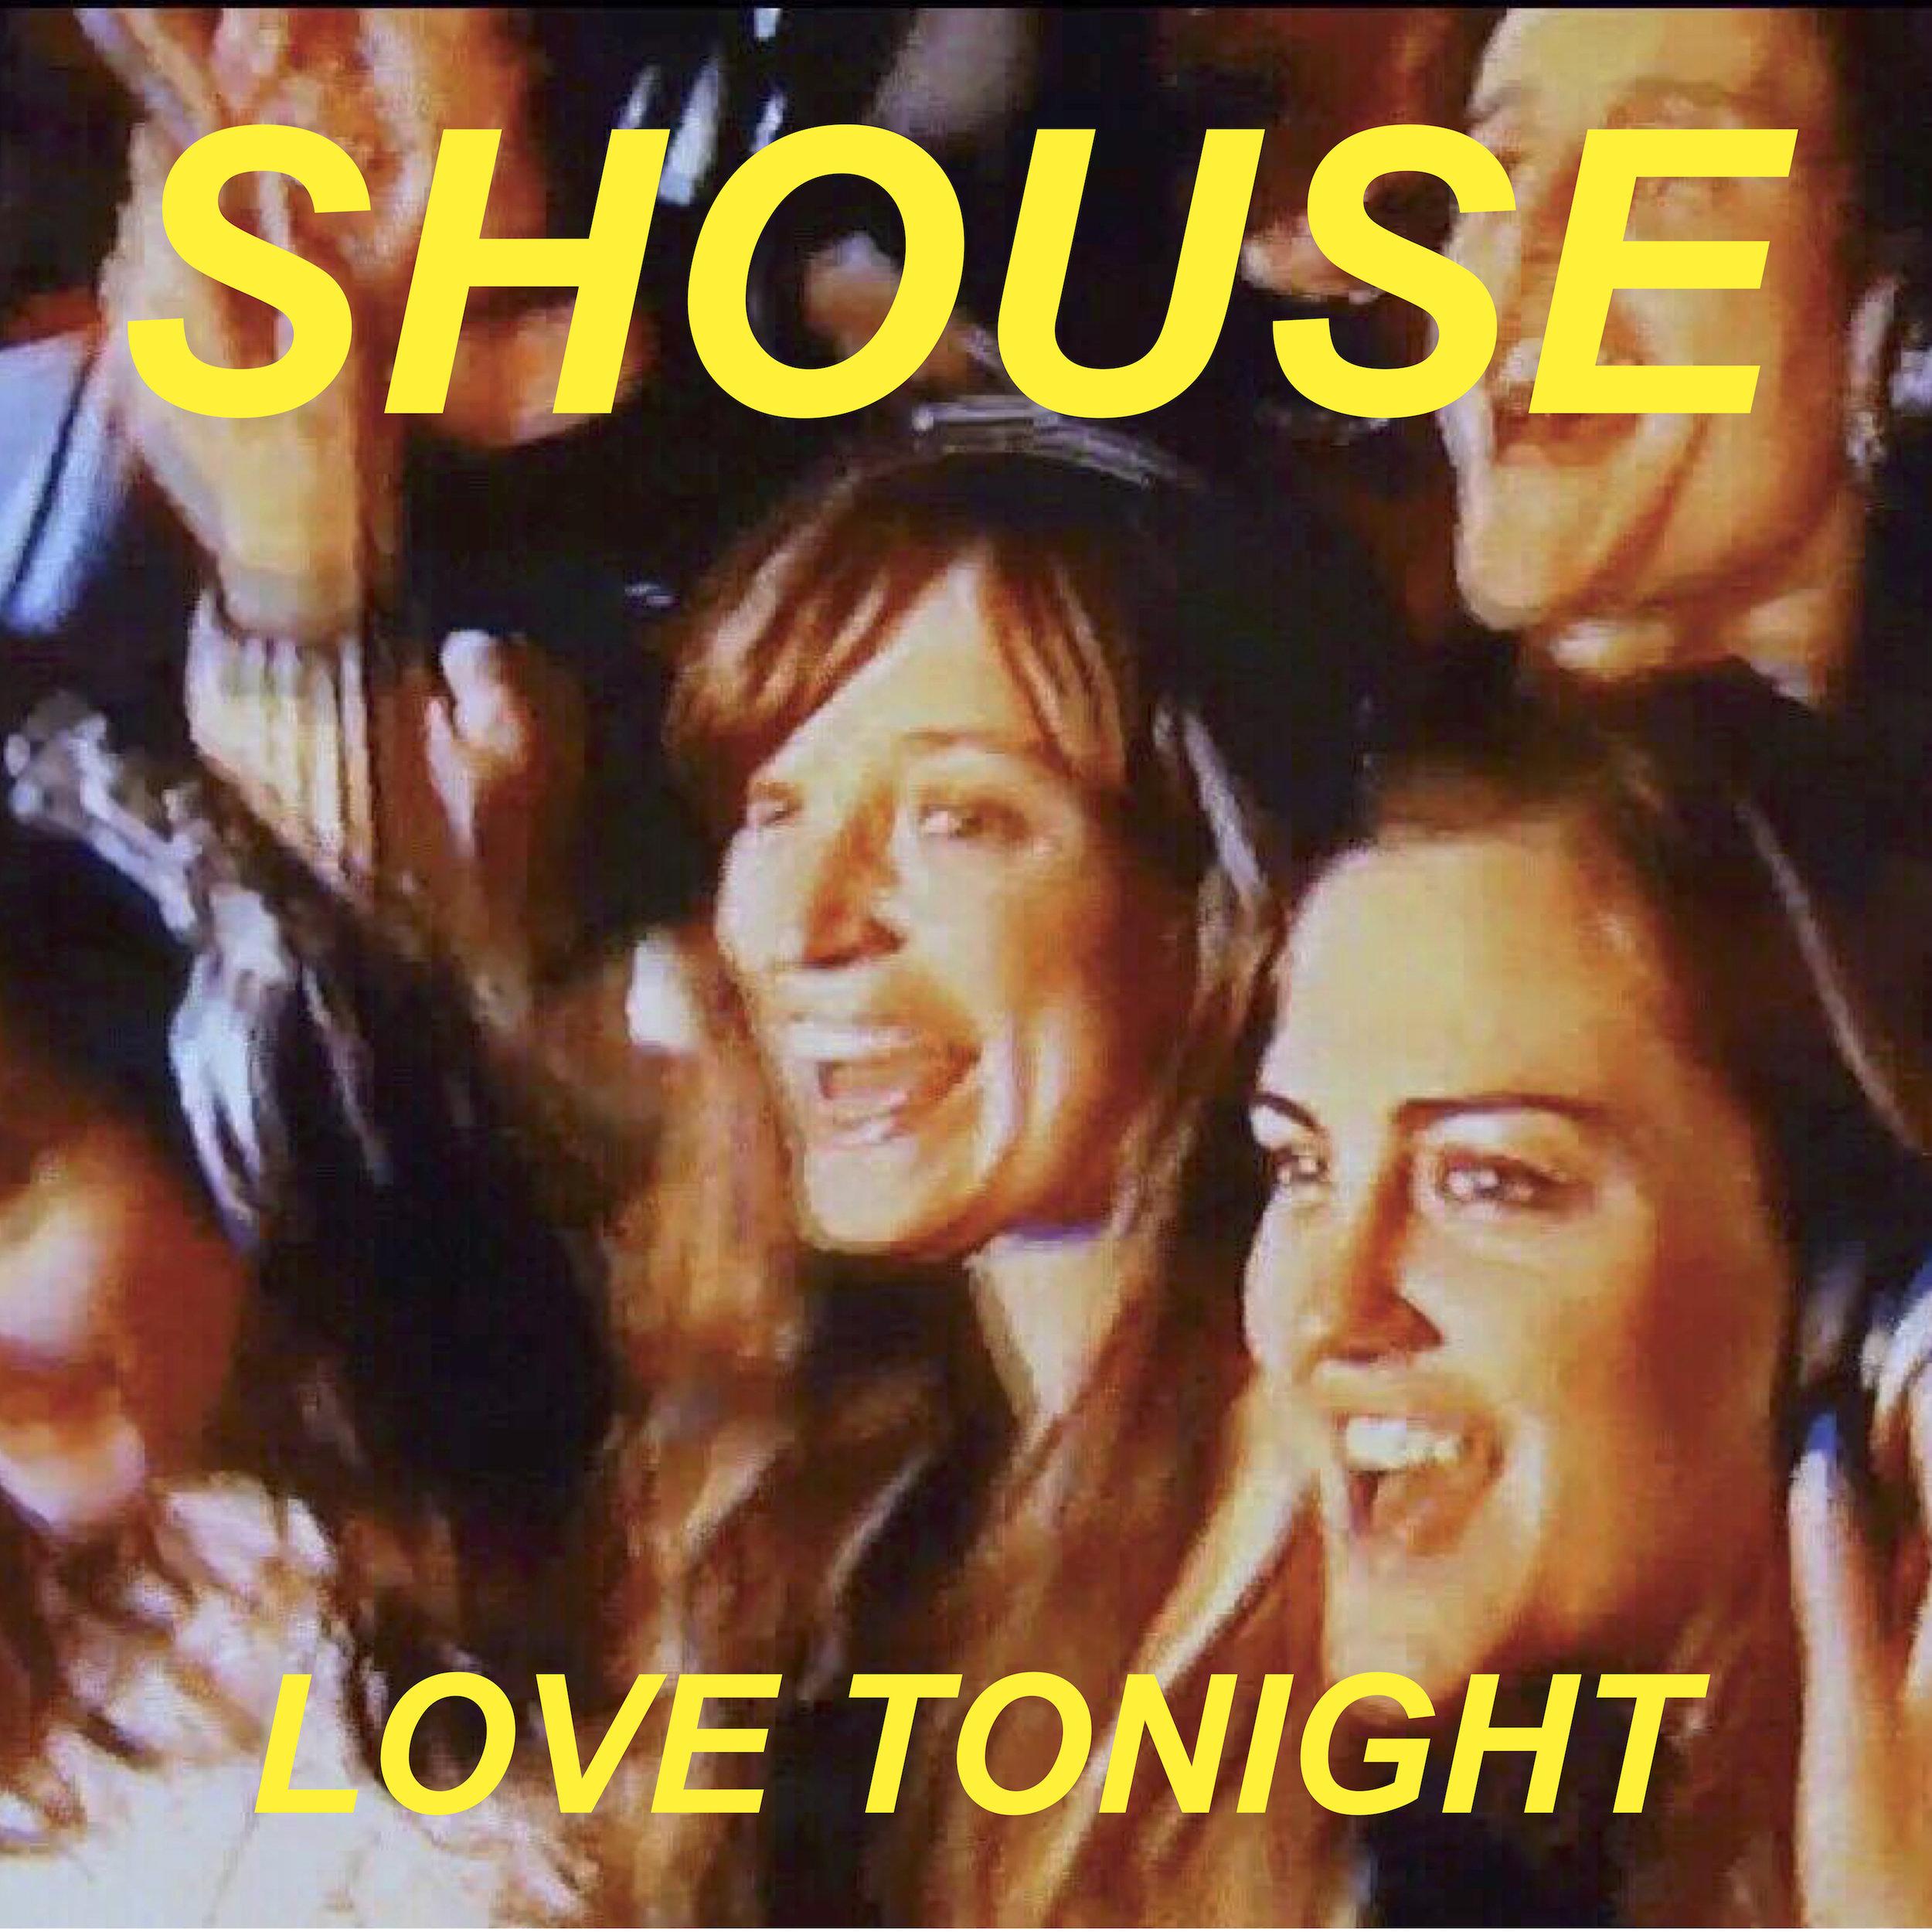 SHOUSE - LOVE TONIGHT Digital Sleeve.jpg